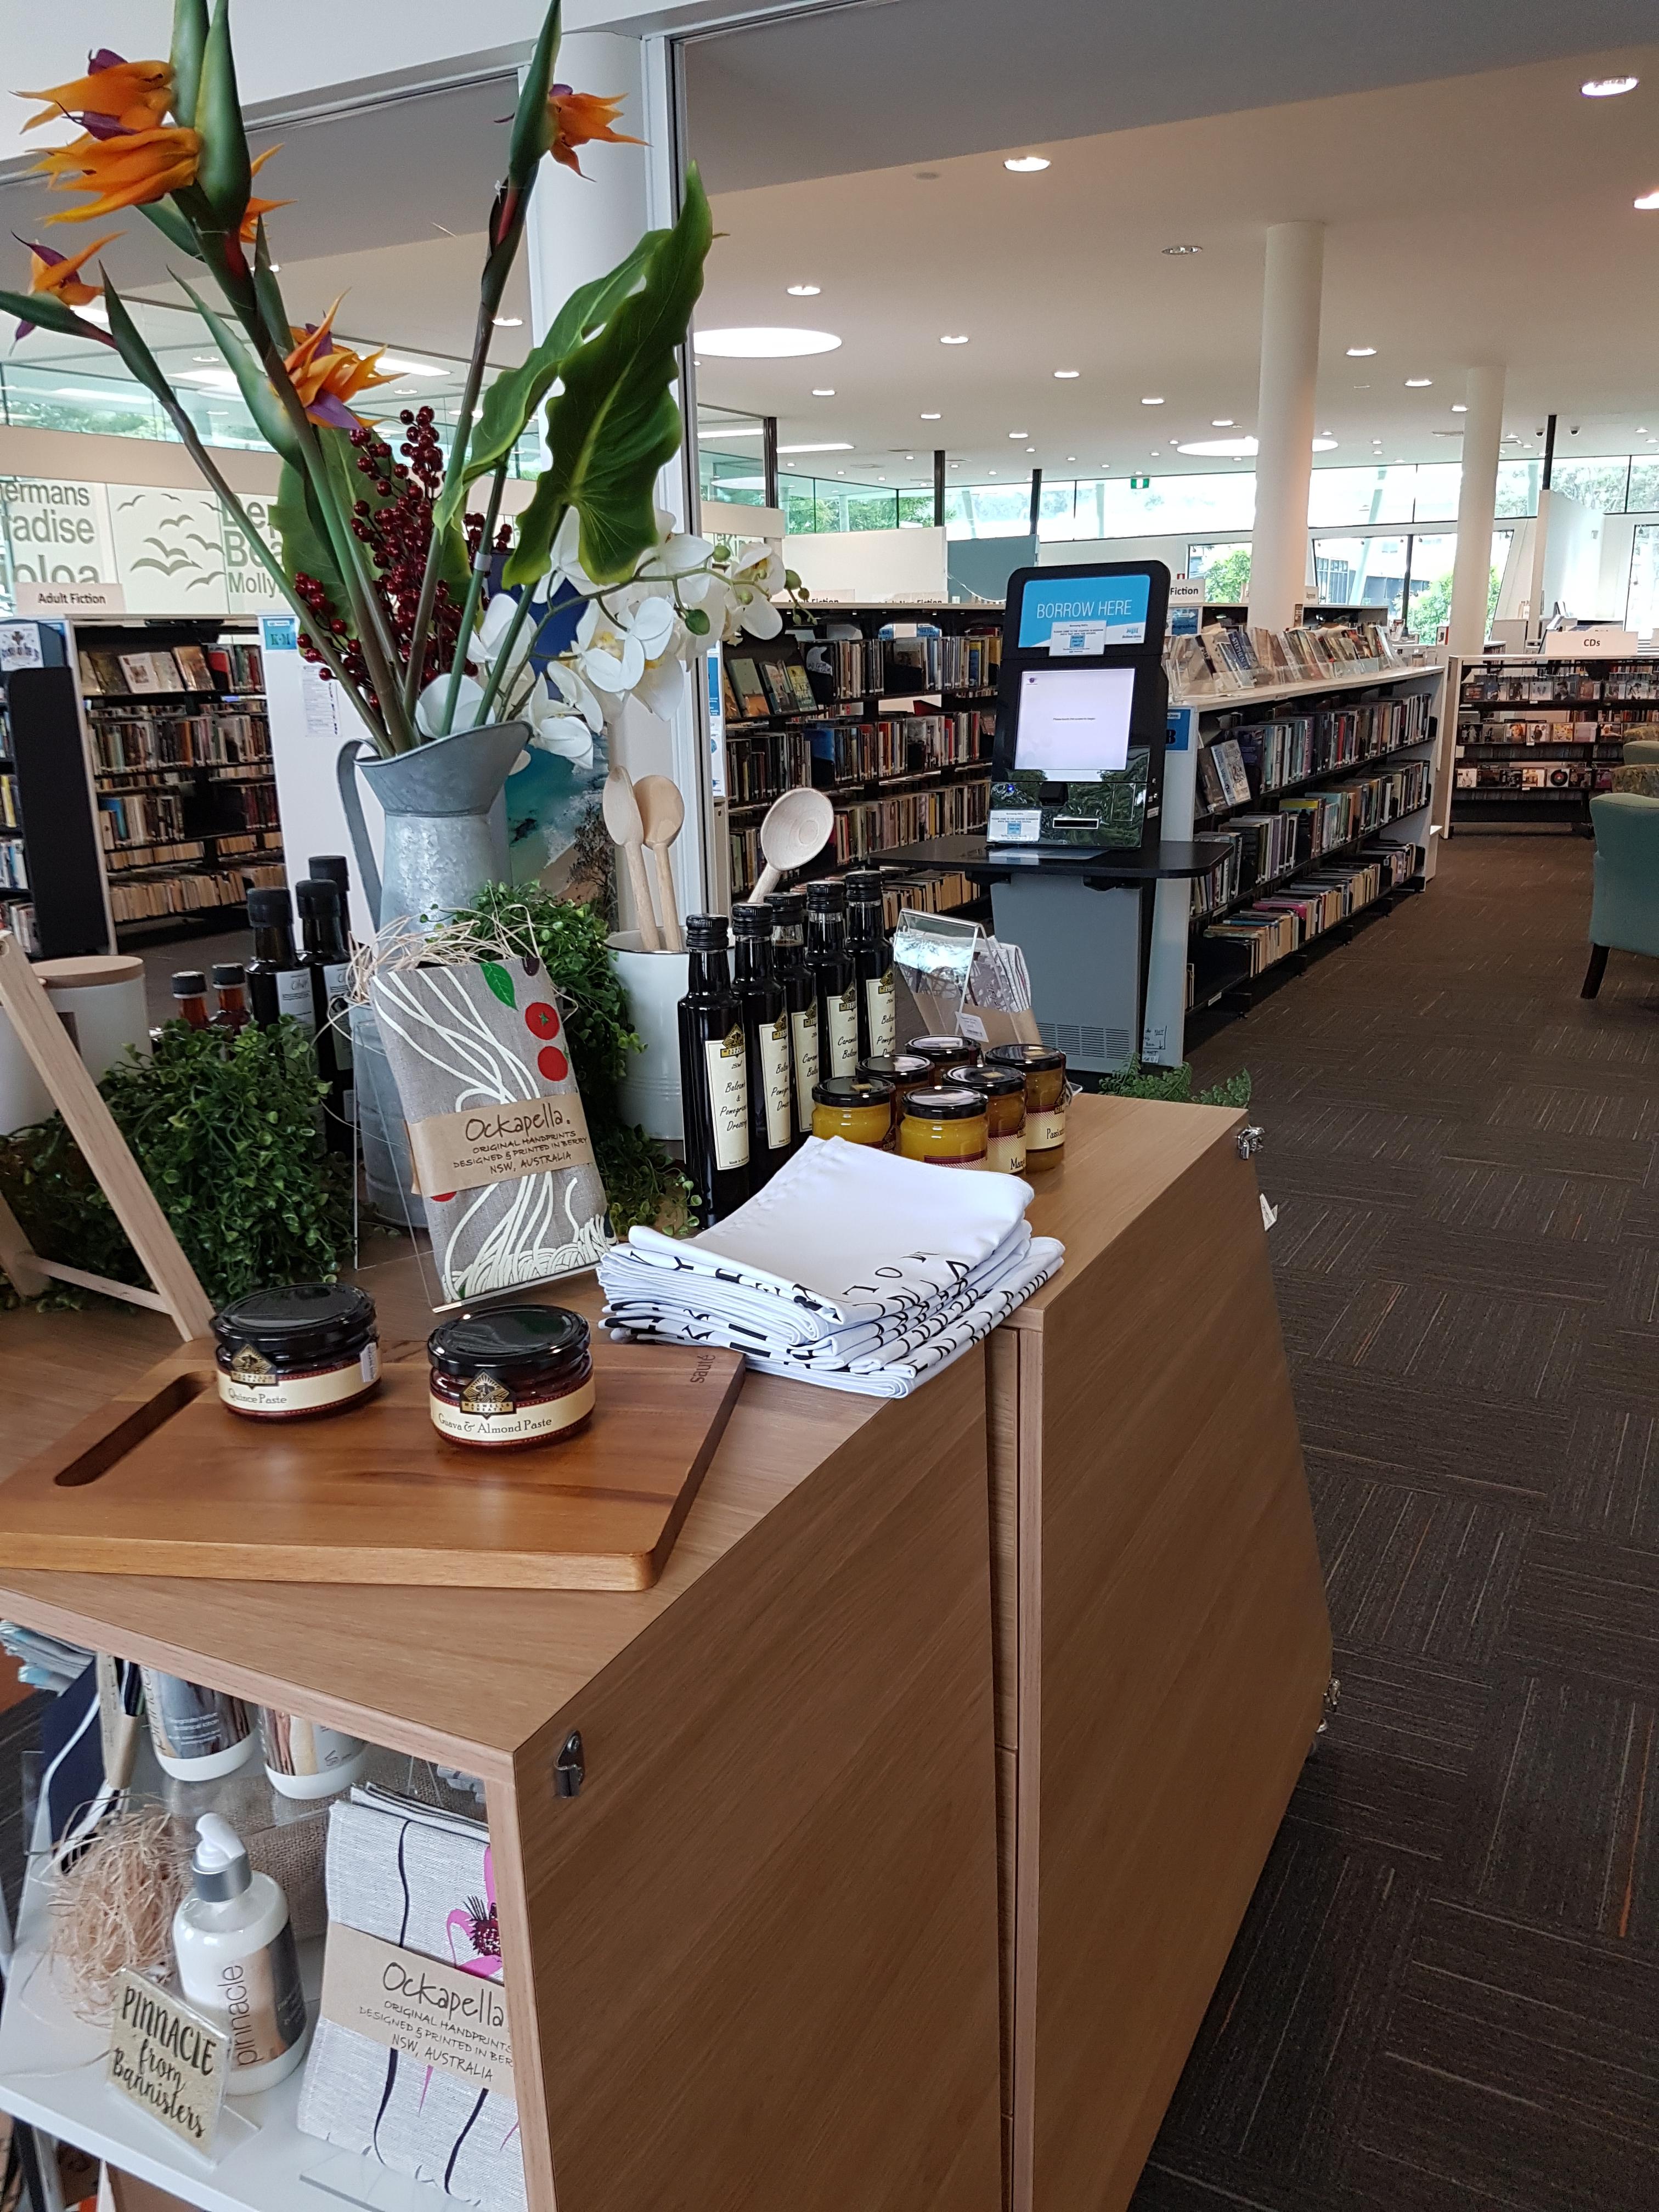 Ulladulla Library, NSW, 23 November 2016